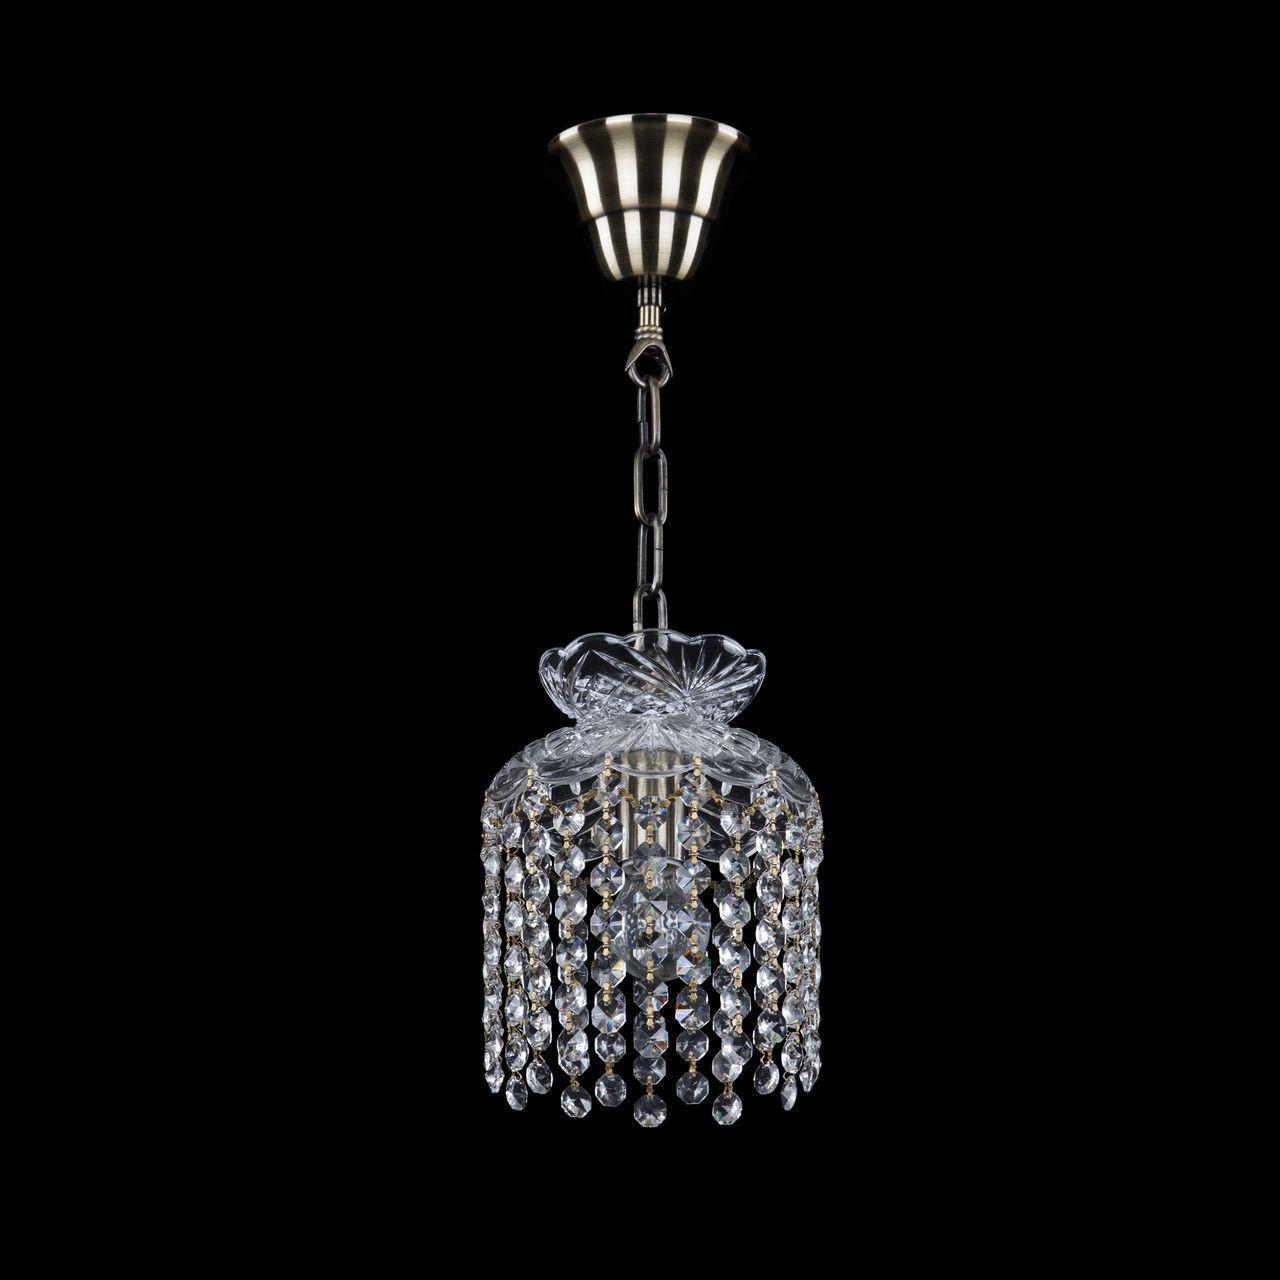 Подвесной светильник Bohemia Ivele 14781/15 Pa R